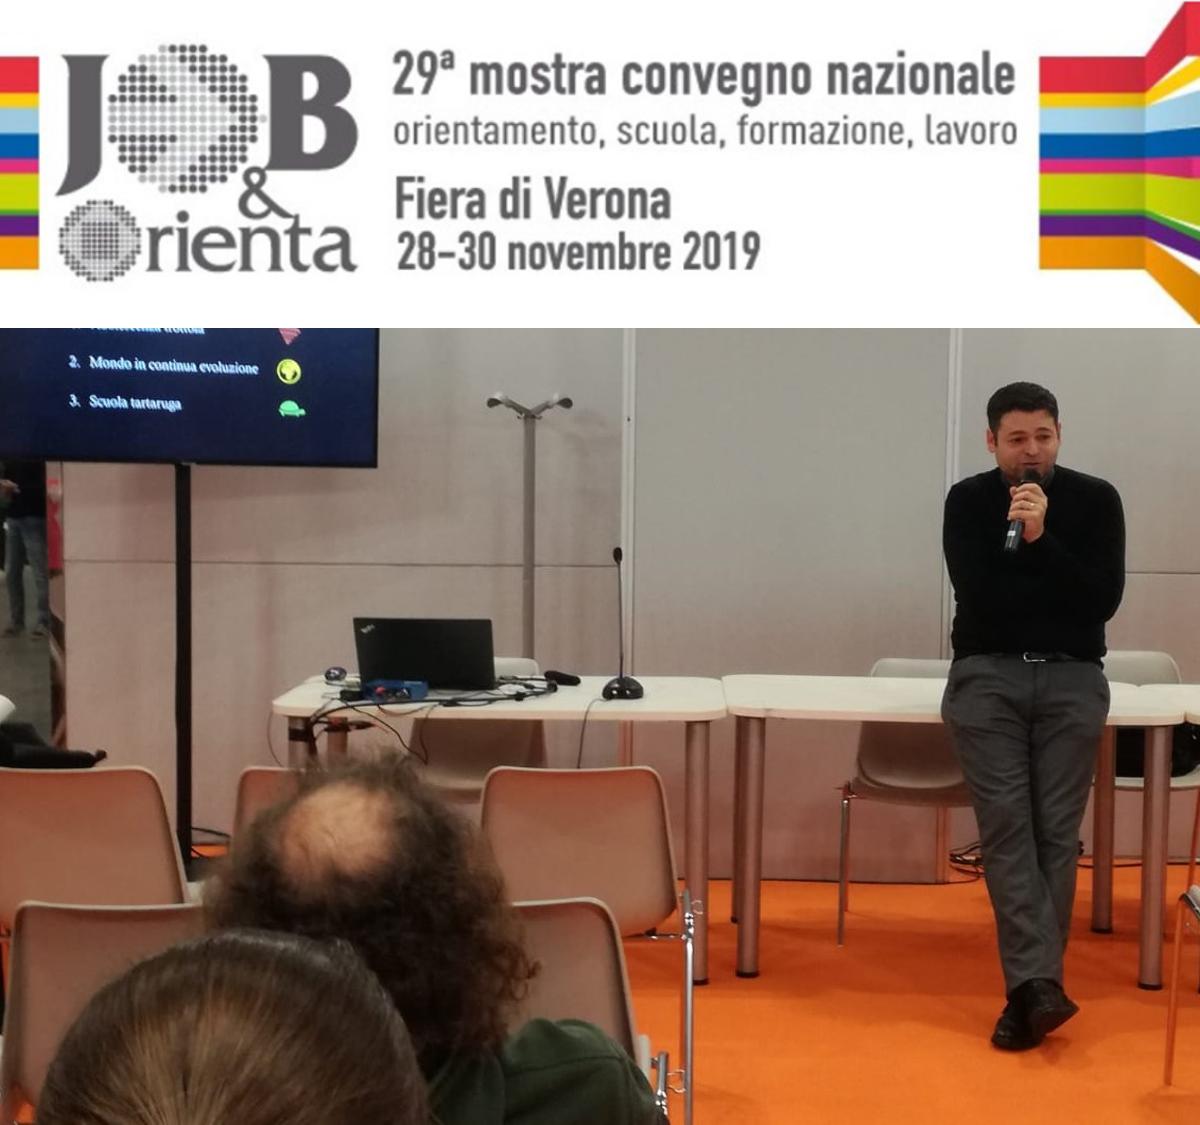 Job&Orienta Verona 2019